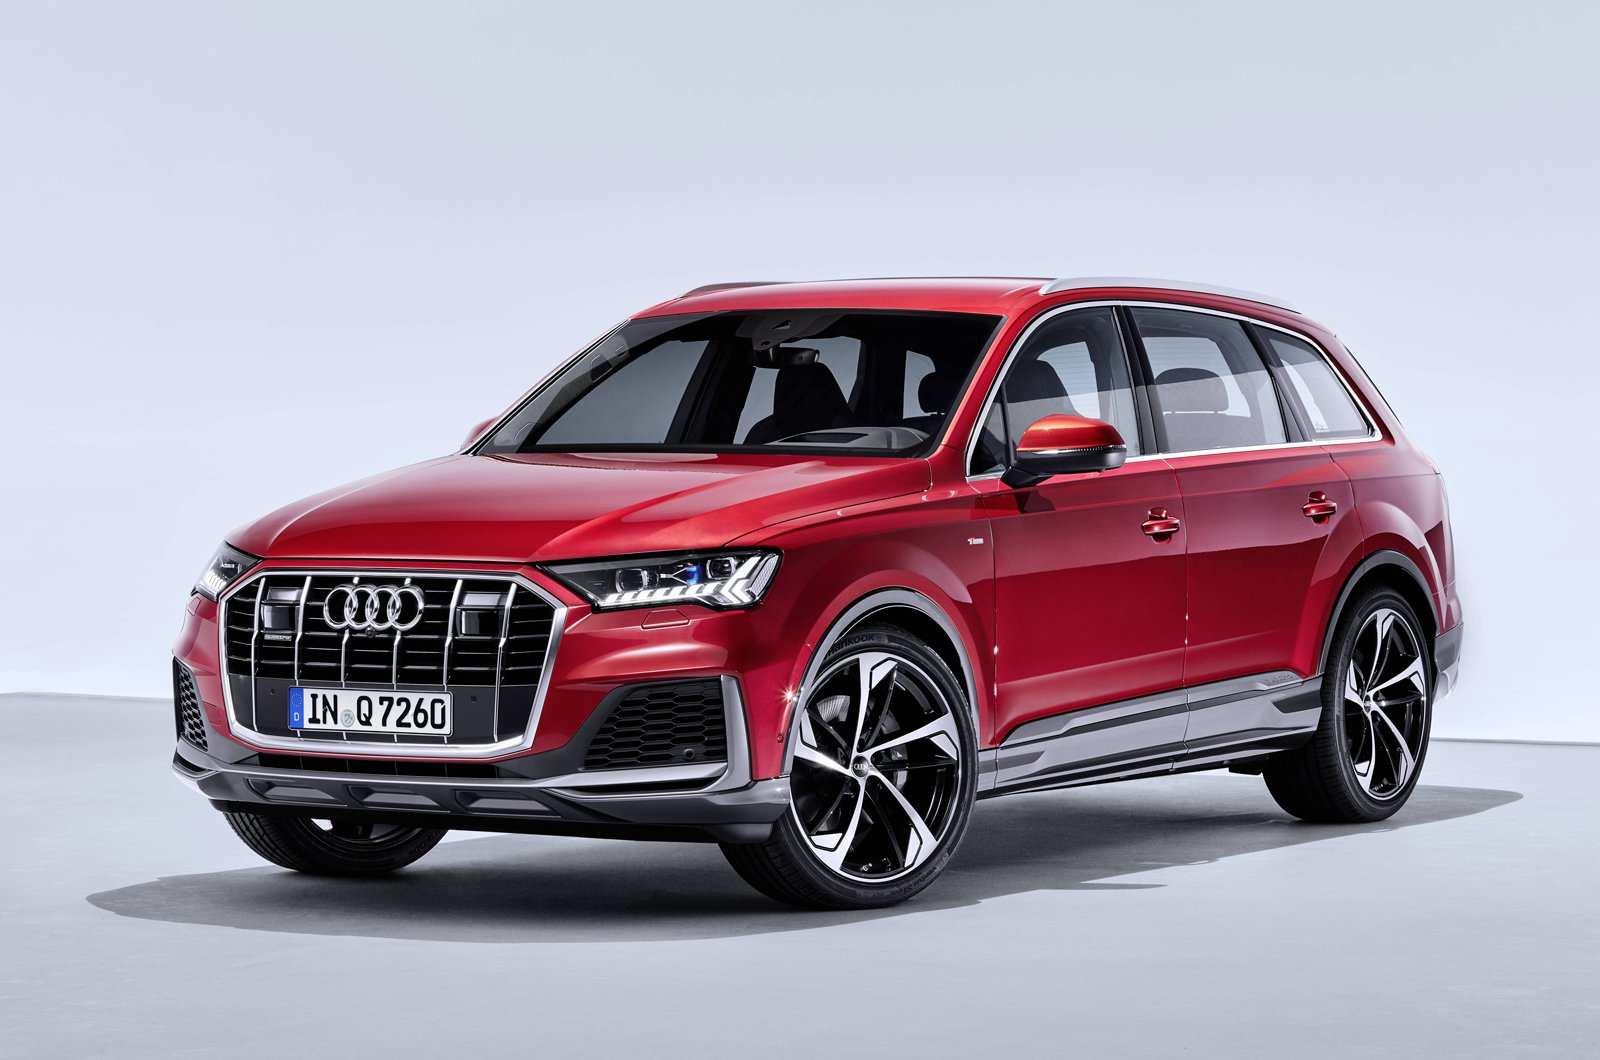 61 Great Audi Motoren 2020 Exterior and Interior for Audi Motoren 2020